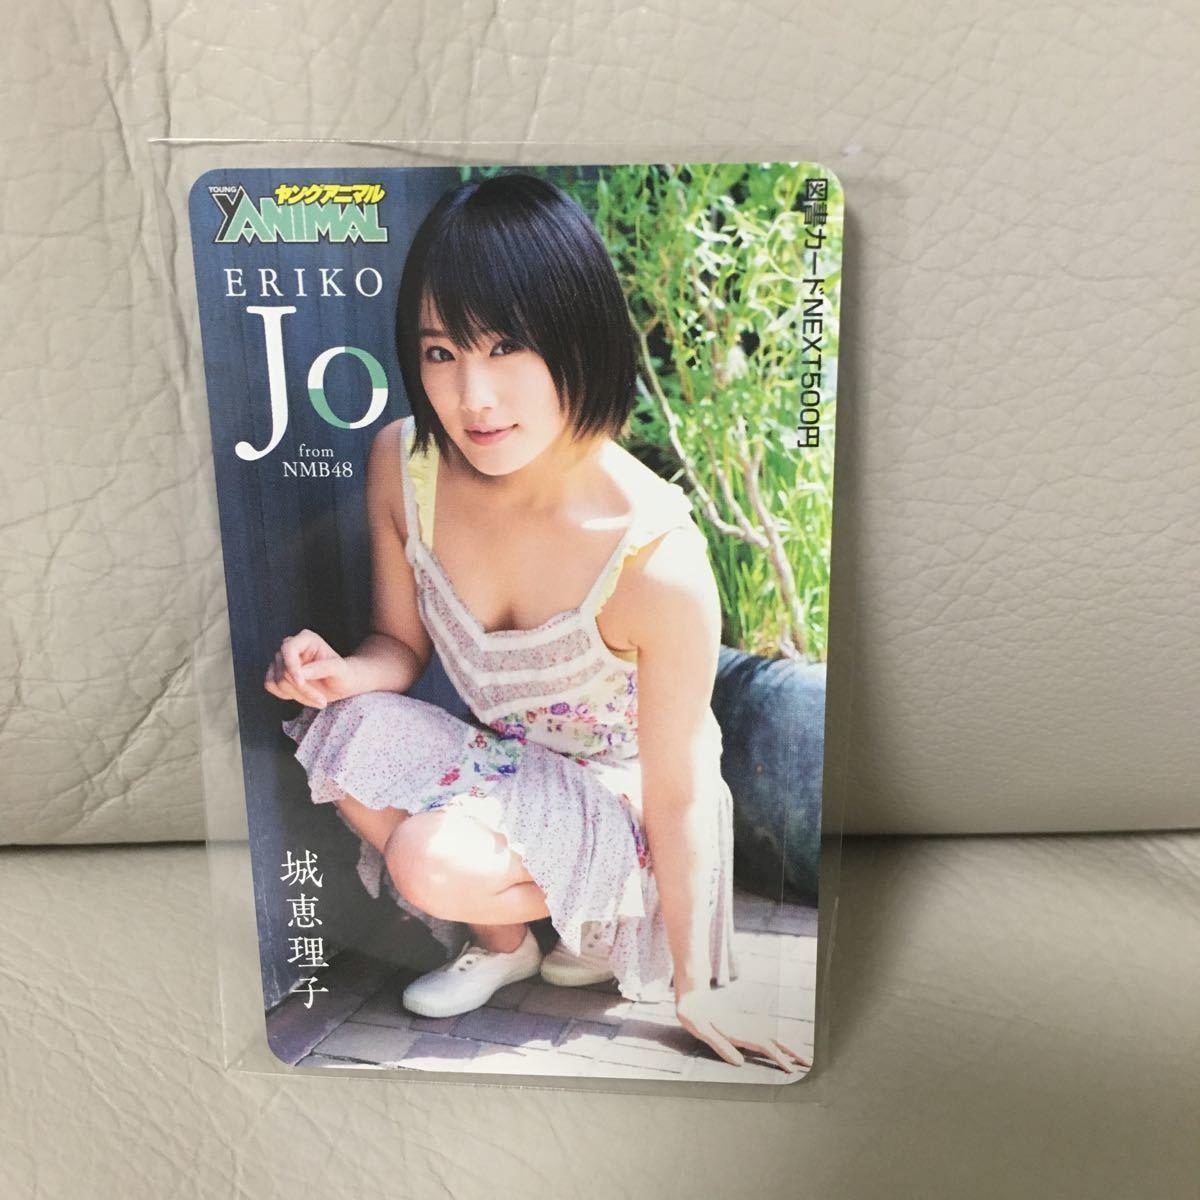 NMB48 城恵理子 ヤングアニマル 図書カード 抽選 抽プレ 当選 限定 レア 非売品 当選通知書